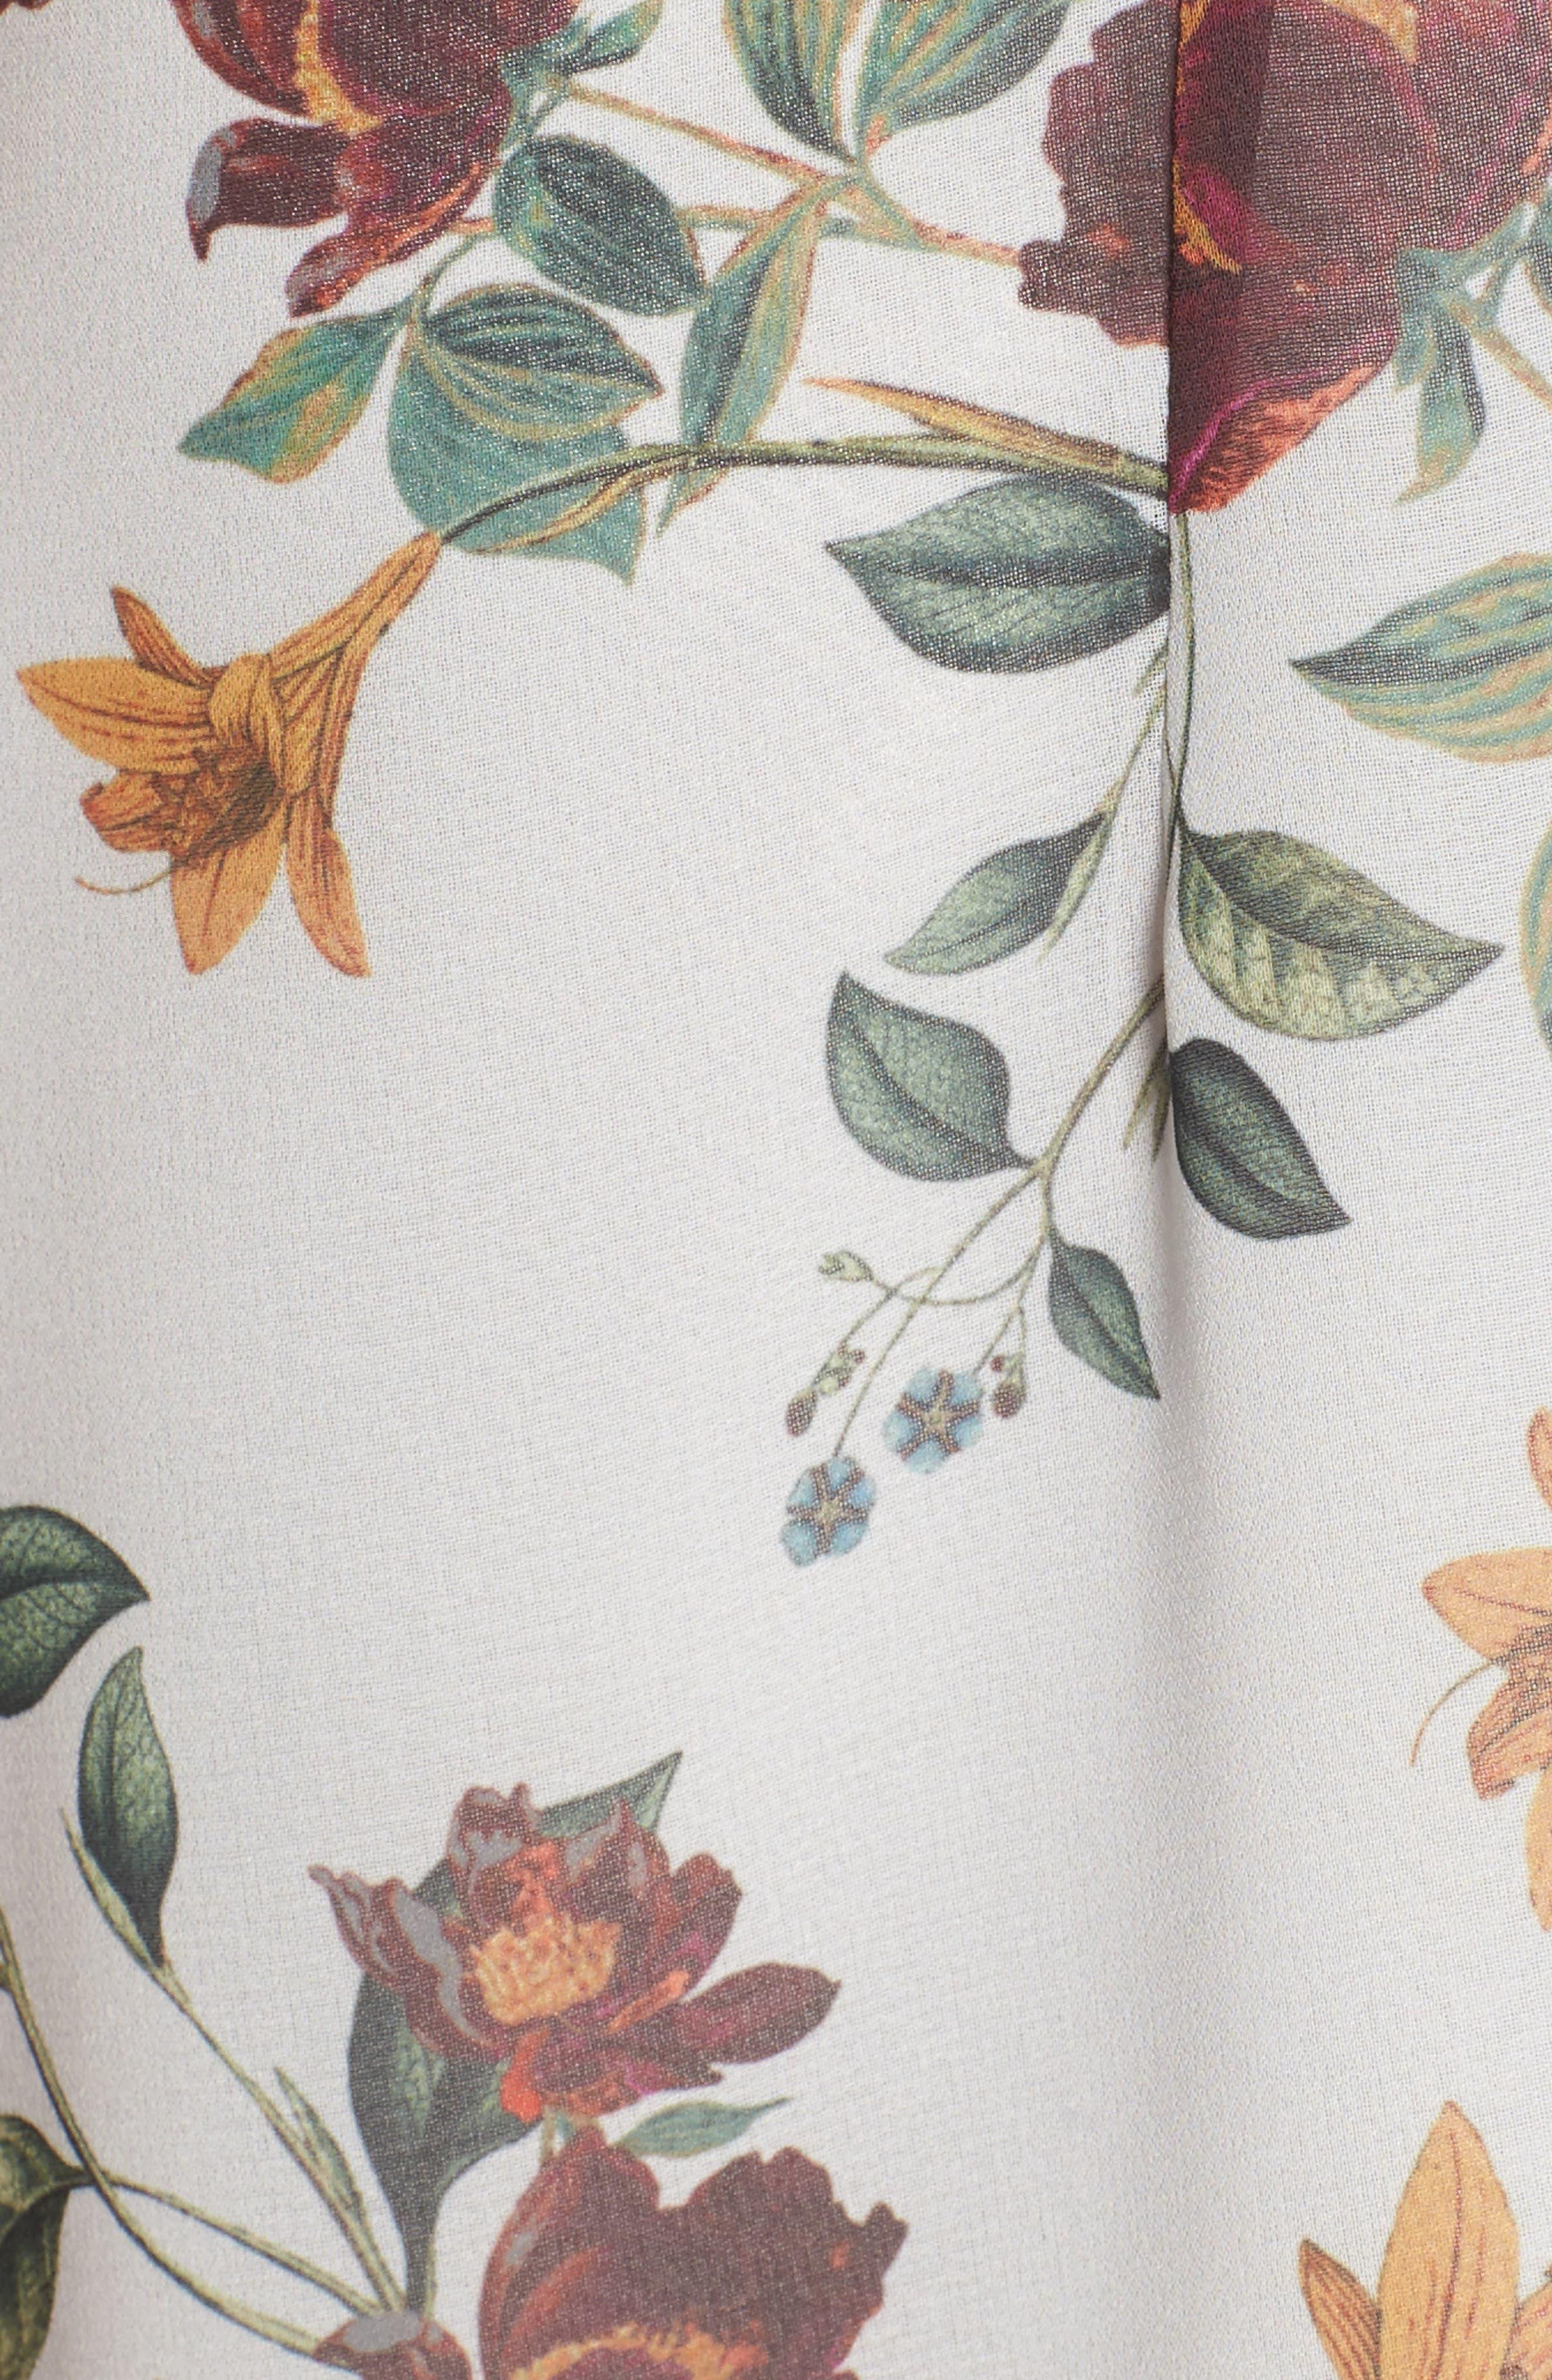 Twilight Dreams Cold Shoulder Romper,                             Alternate thumbnail 6, color,                             Grey Garden Floral